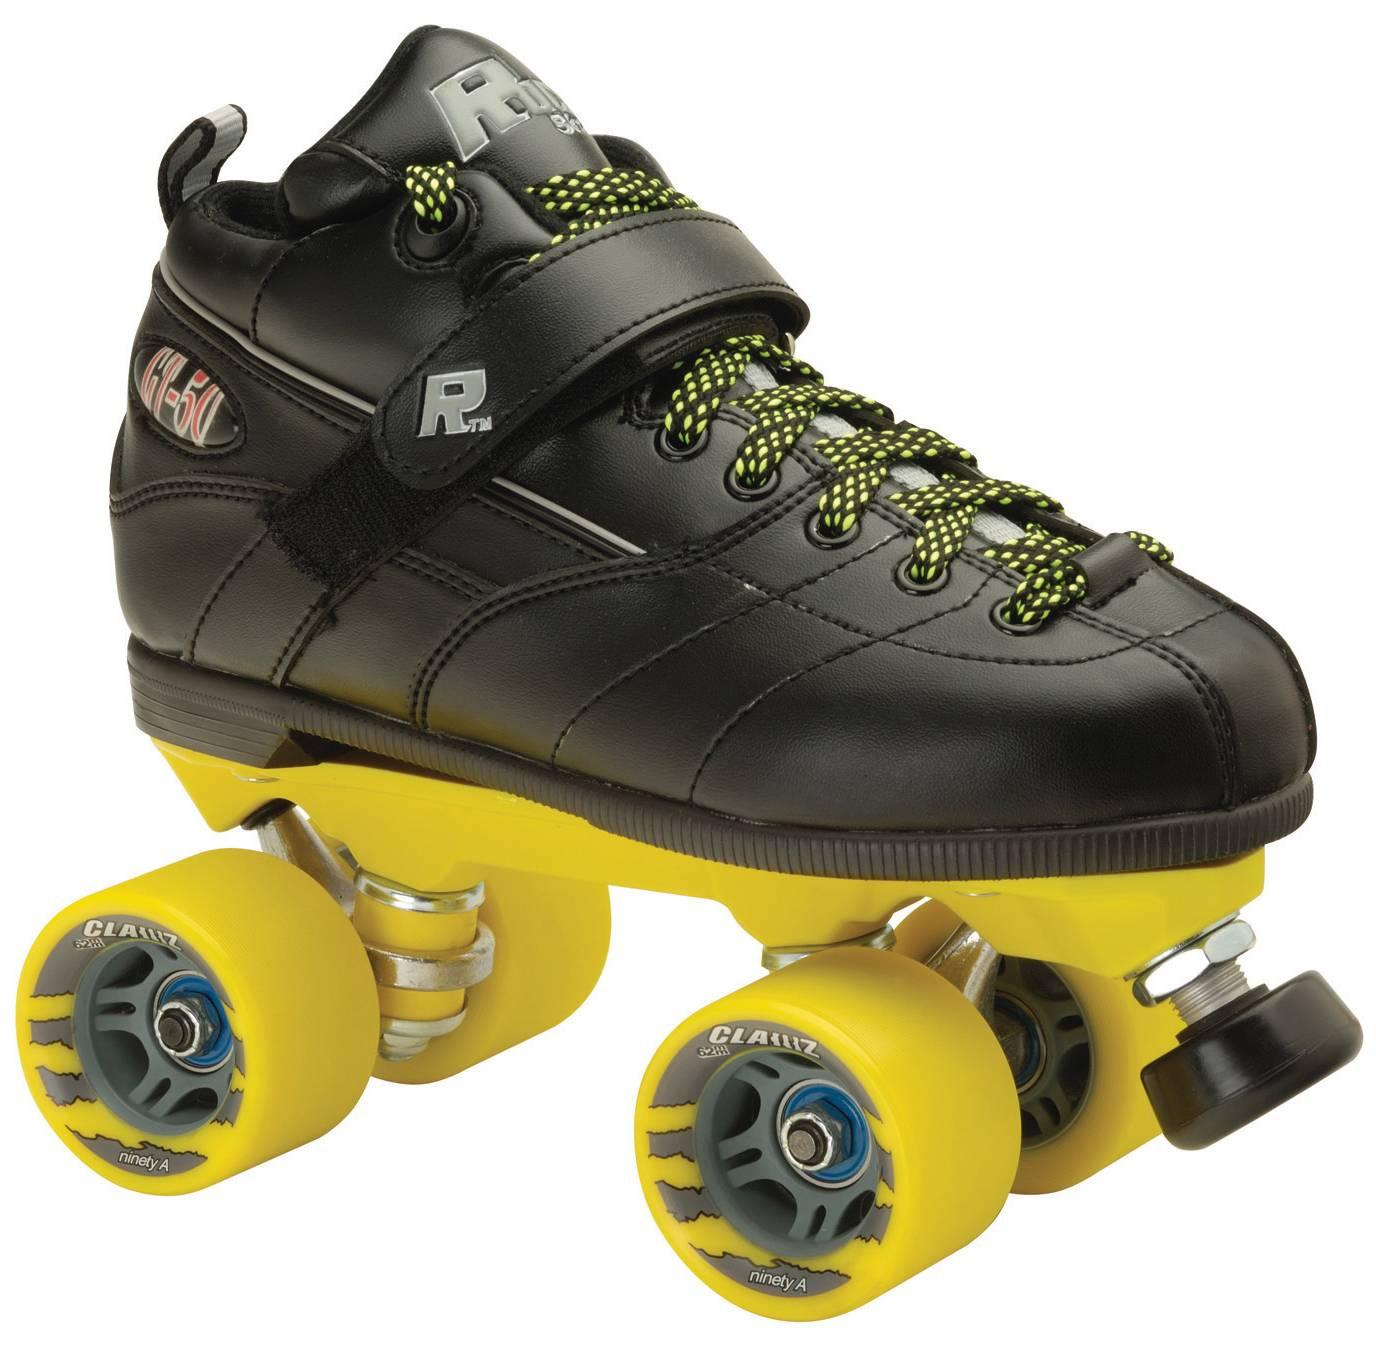 Roller skates in shoes - Roller Skates In Shoes 53